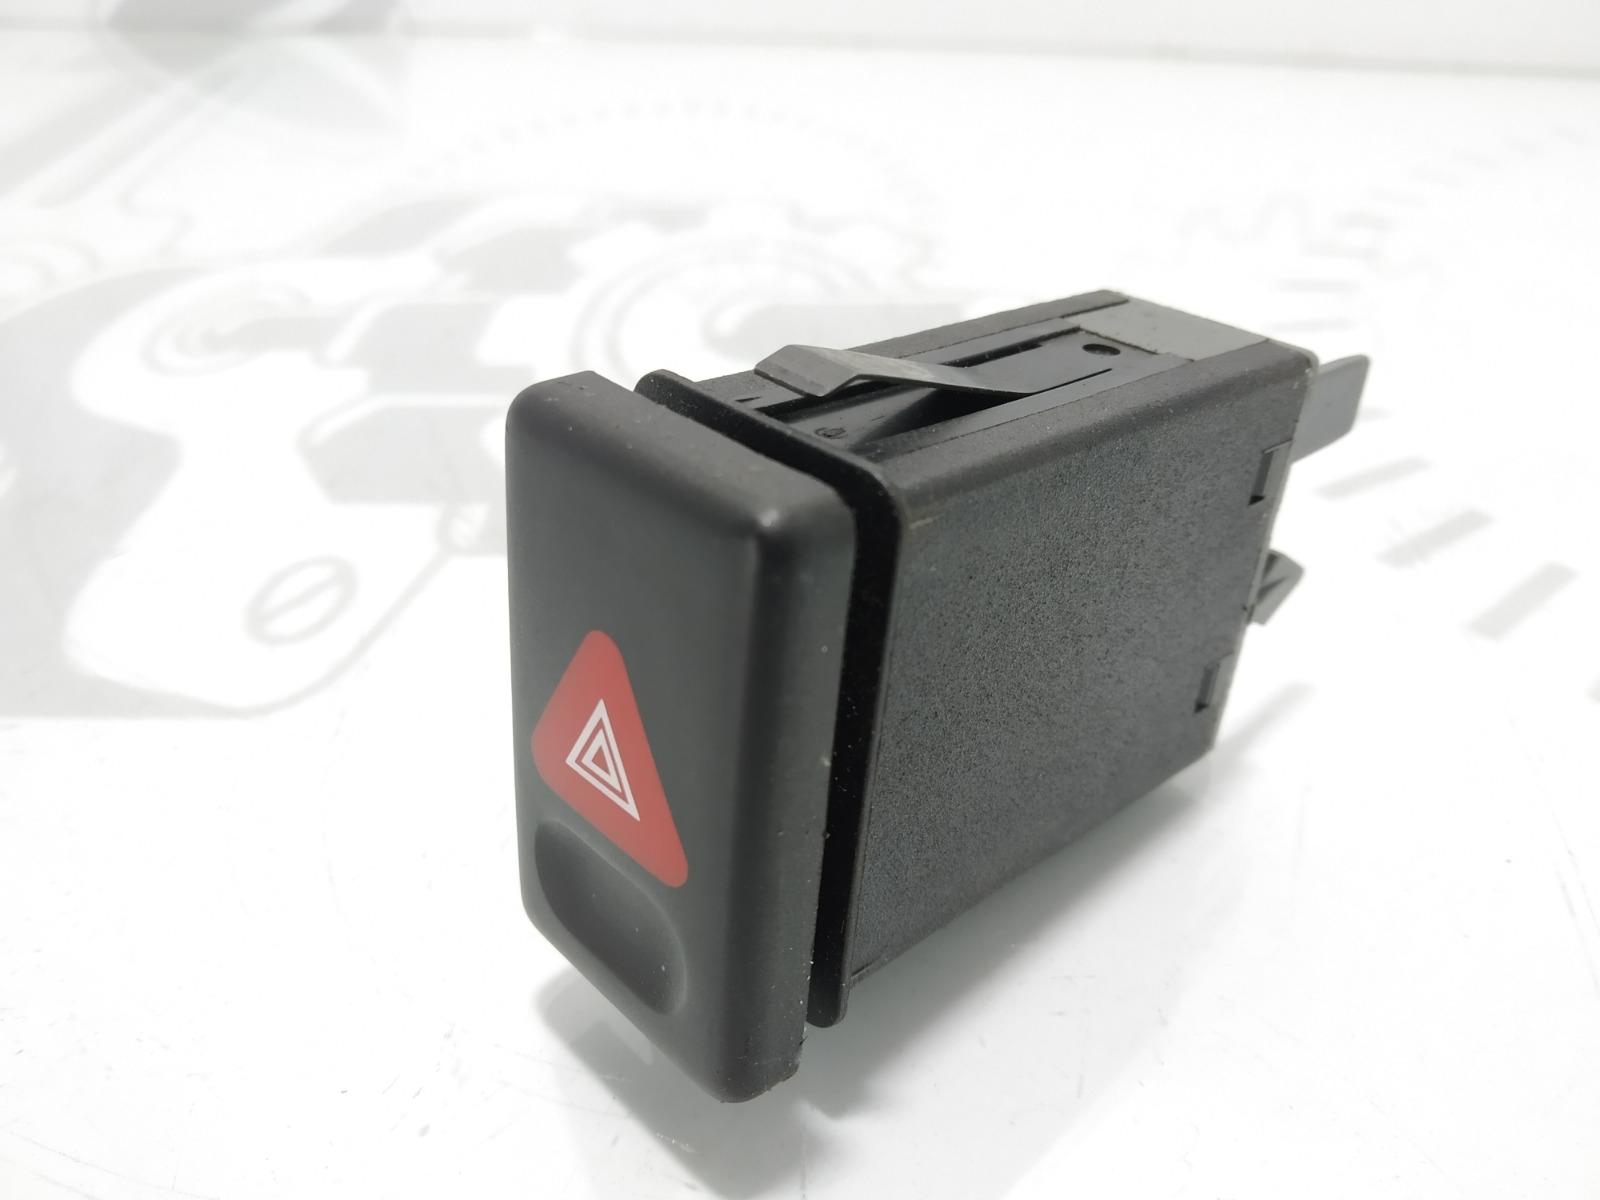 Кнопка аварийной сигнализации Ford Galaxy 2.3 I 2000 (б/у)